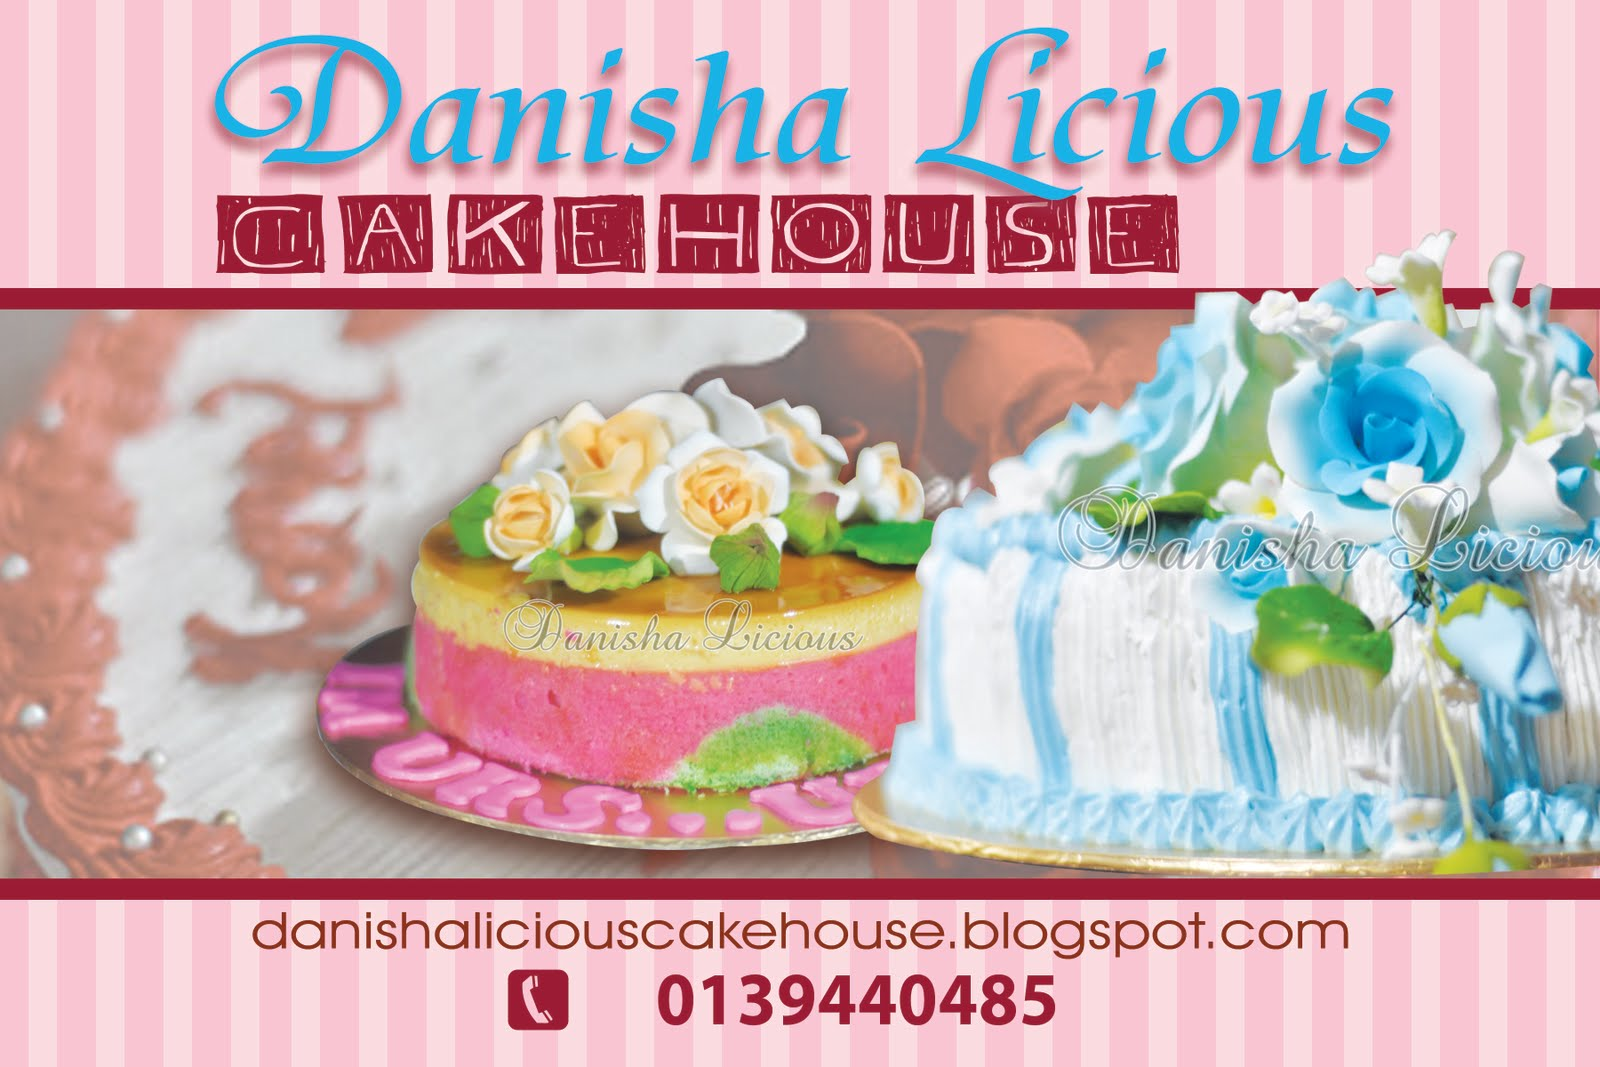 Danisha_Licious Cake House